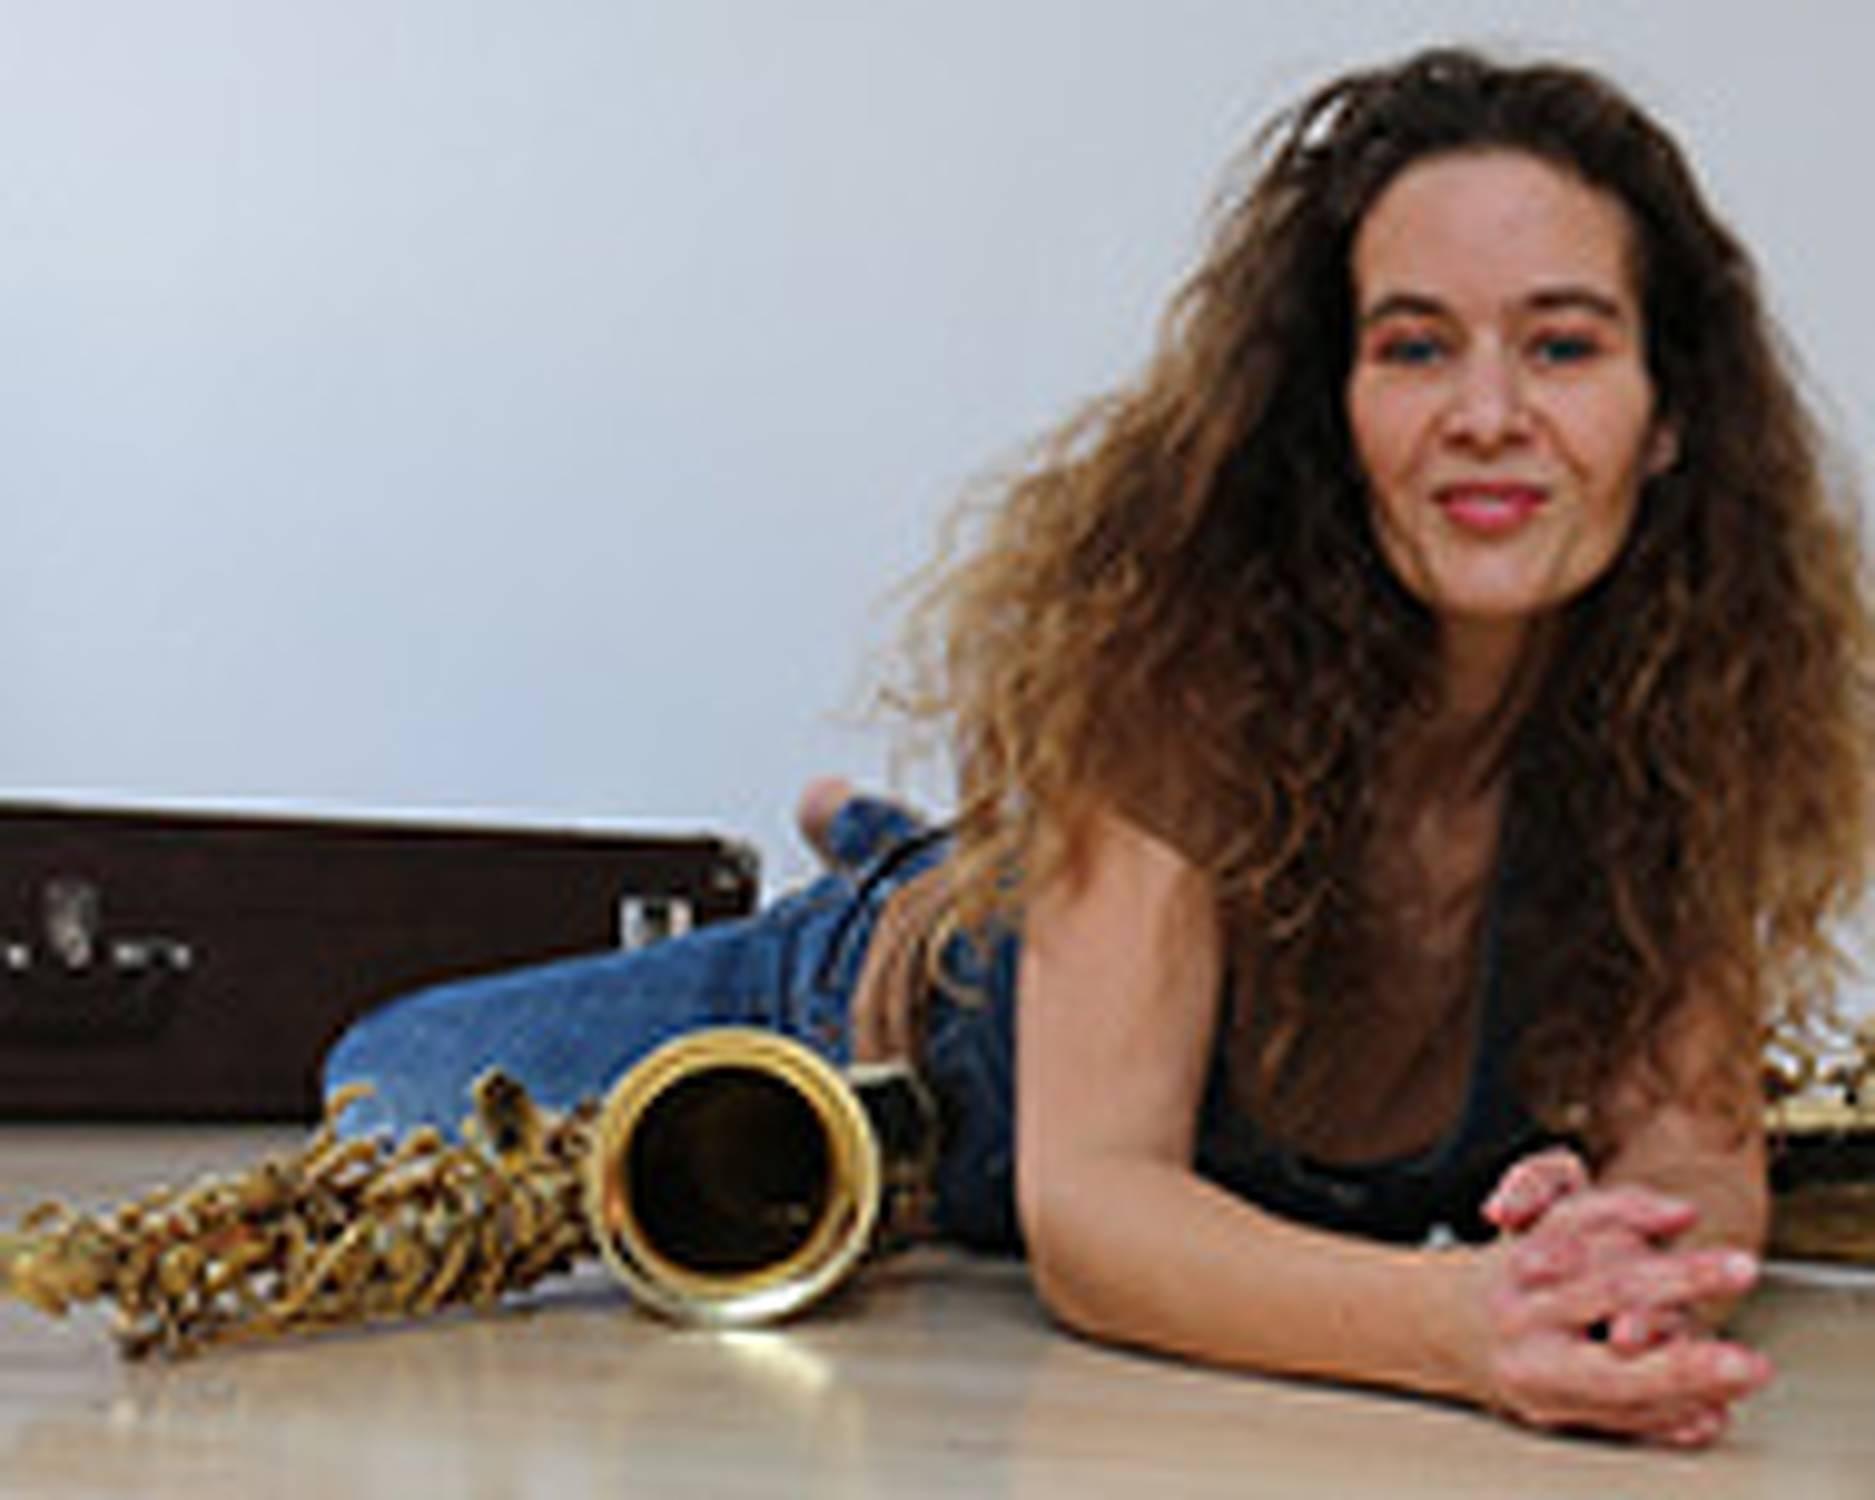 Lady Luck - Saxophone Player from Munich - Künstler-Collection